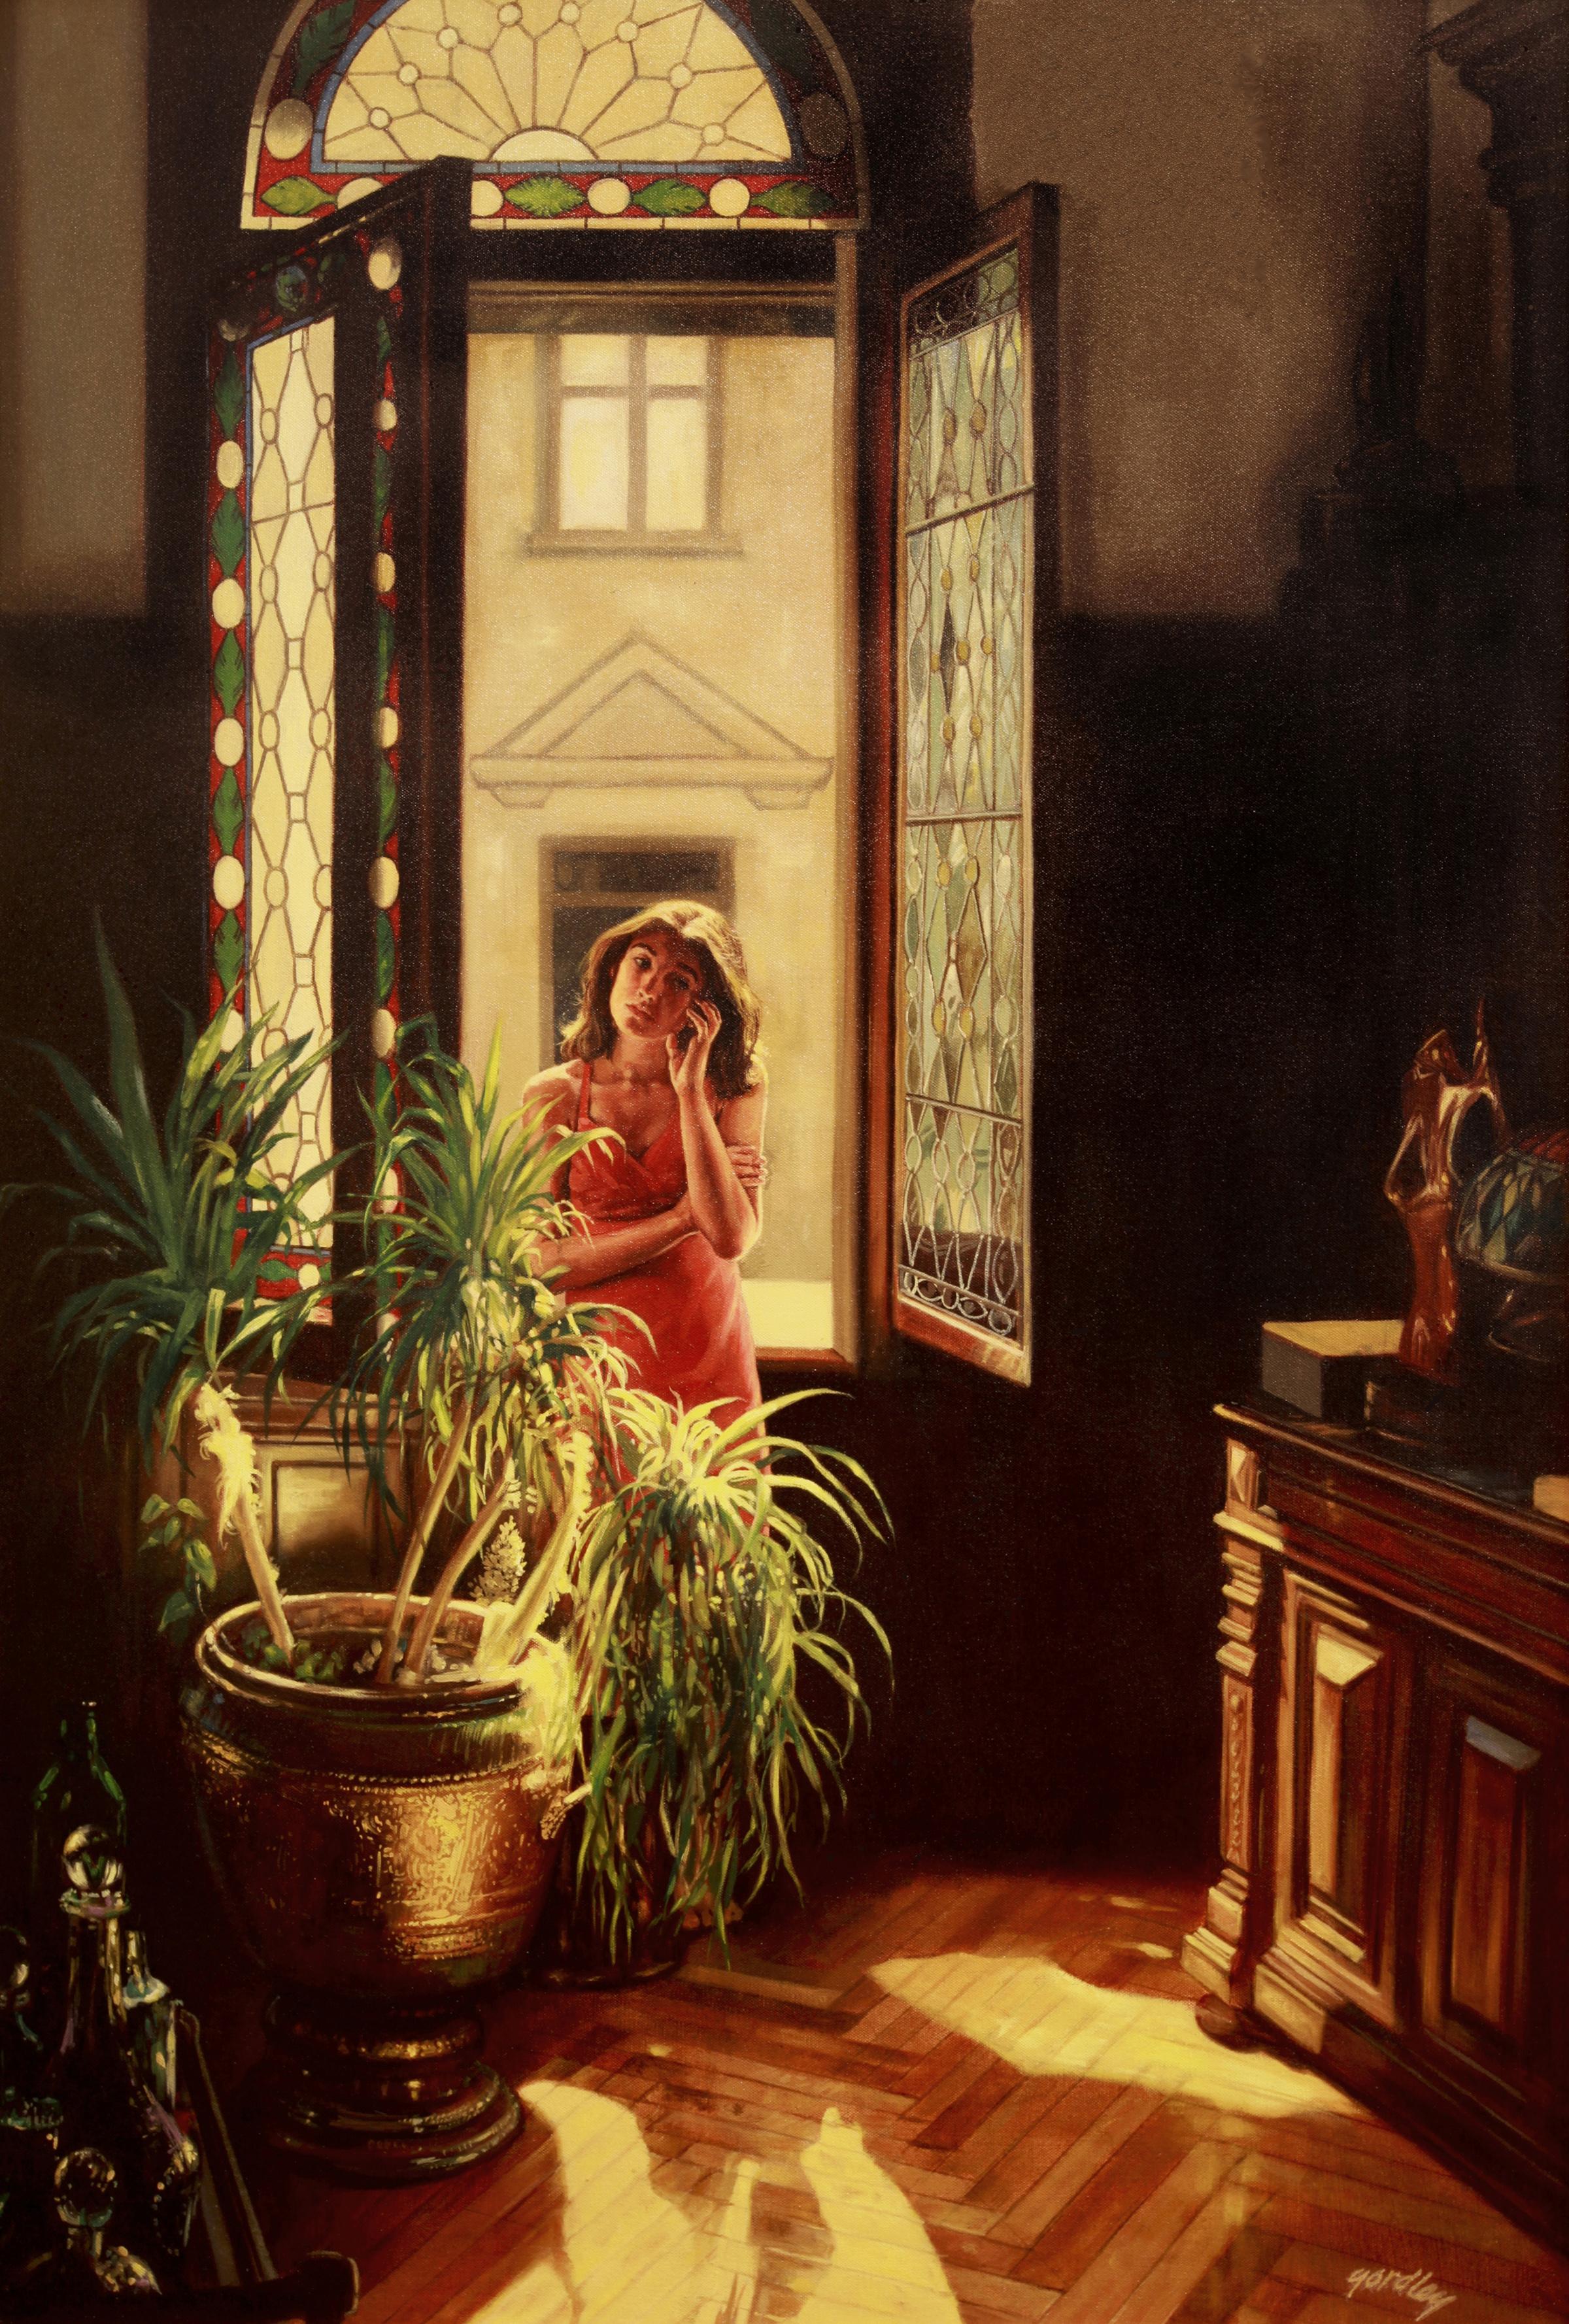 Evan at Noon, Vienna, oil on canvas, 44 x 36 in.